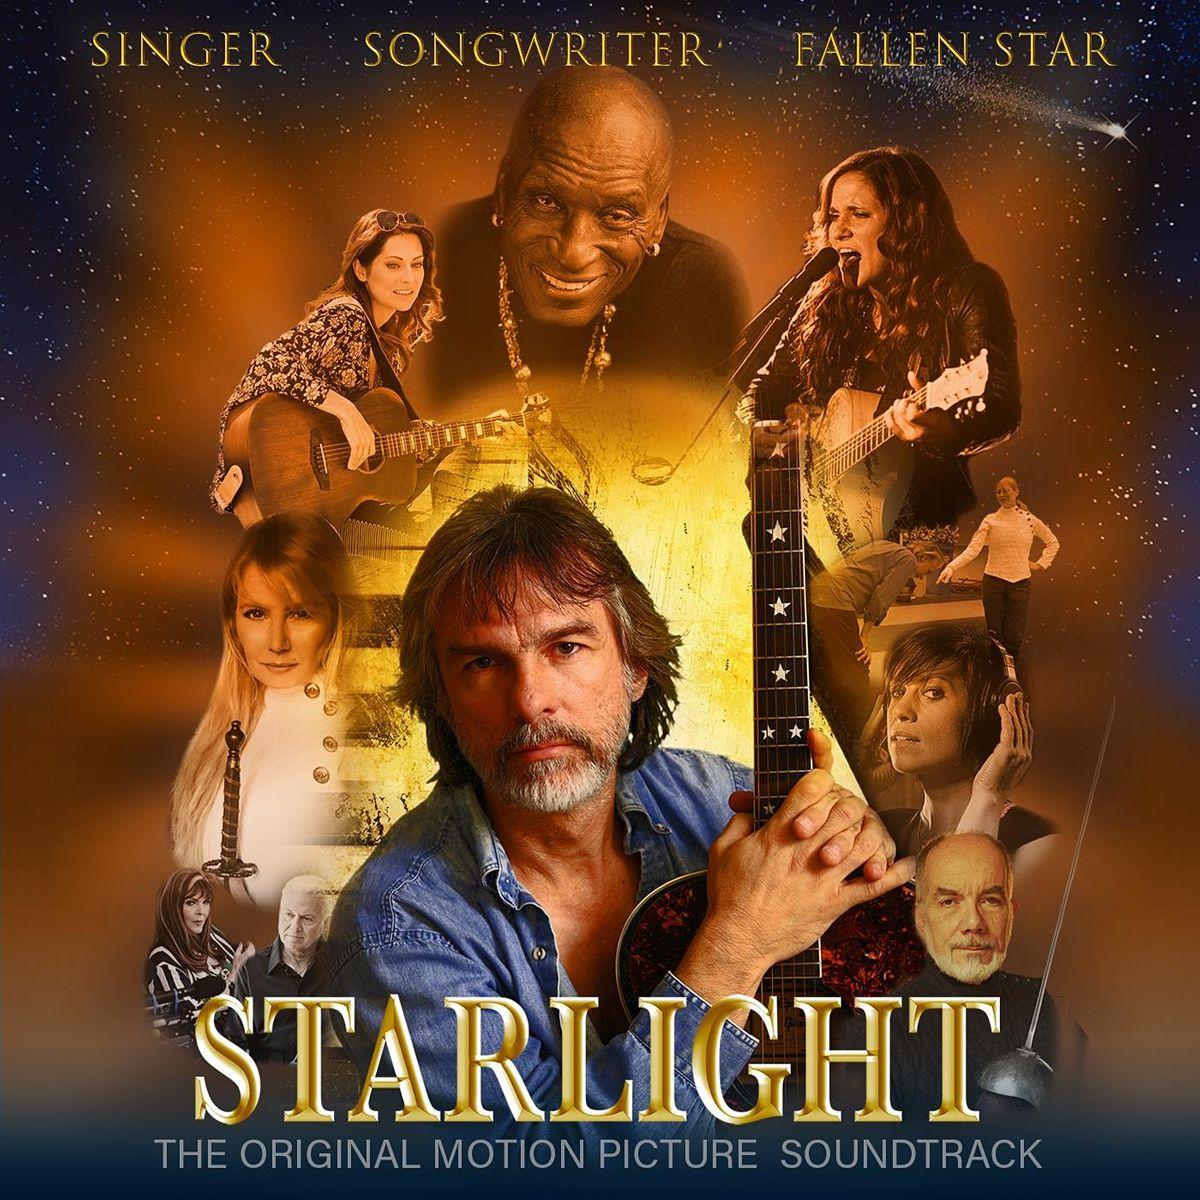 STARLIGHT Movie - Las Vegas World Premiere, 13 November   Event in Las Vegas   AllEvents.in